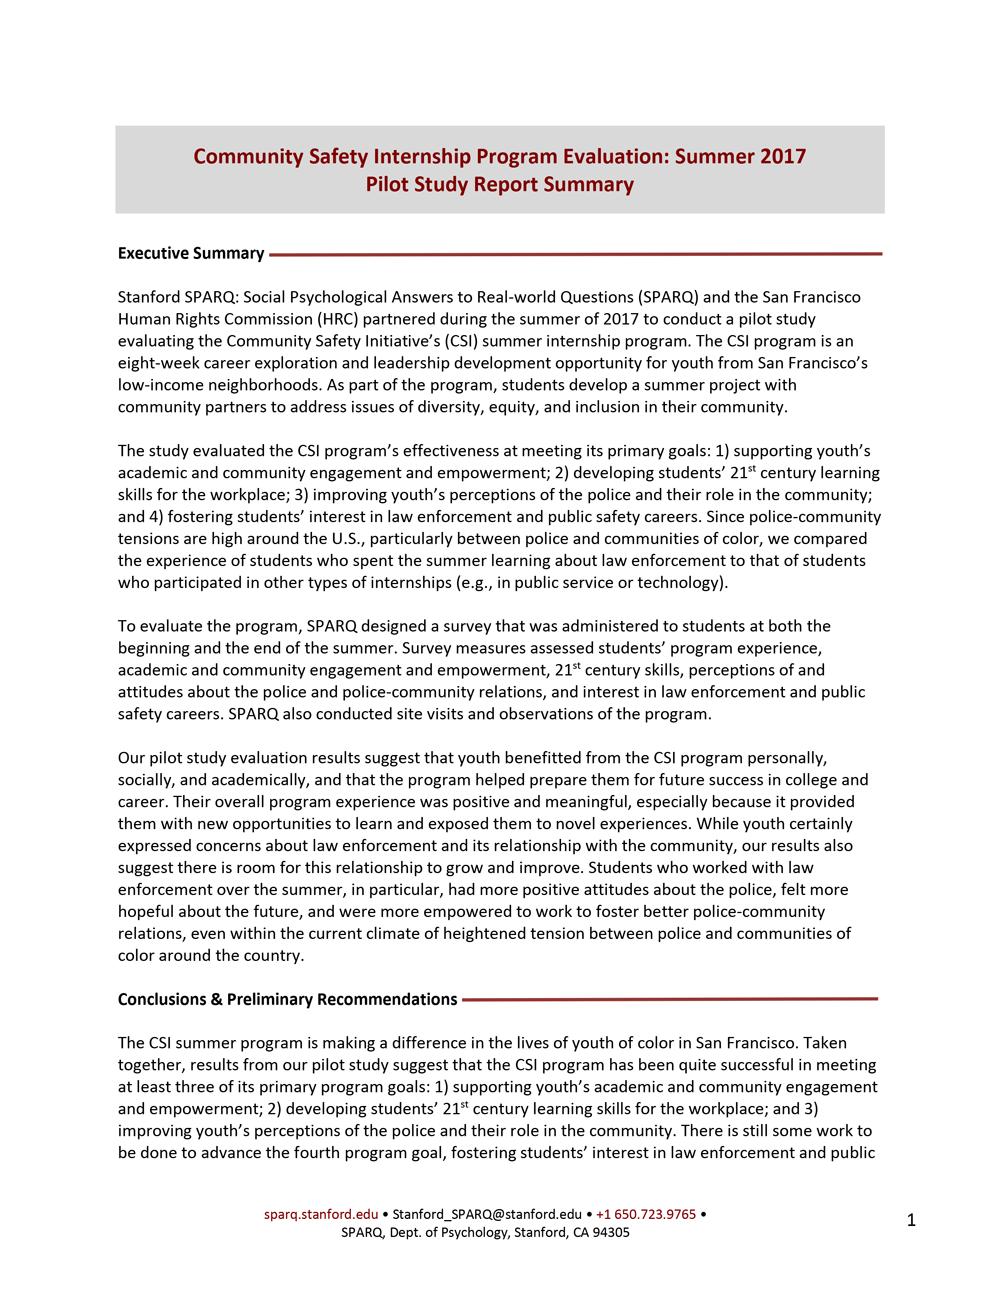 CSI Program Evaluation - Summer 2017 Pilot Study Report Summary